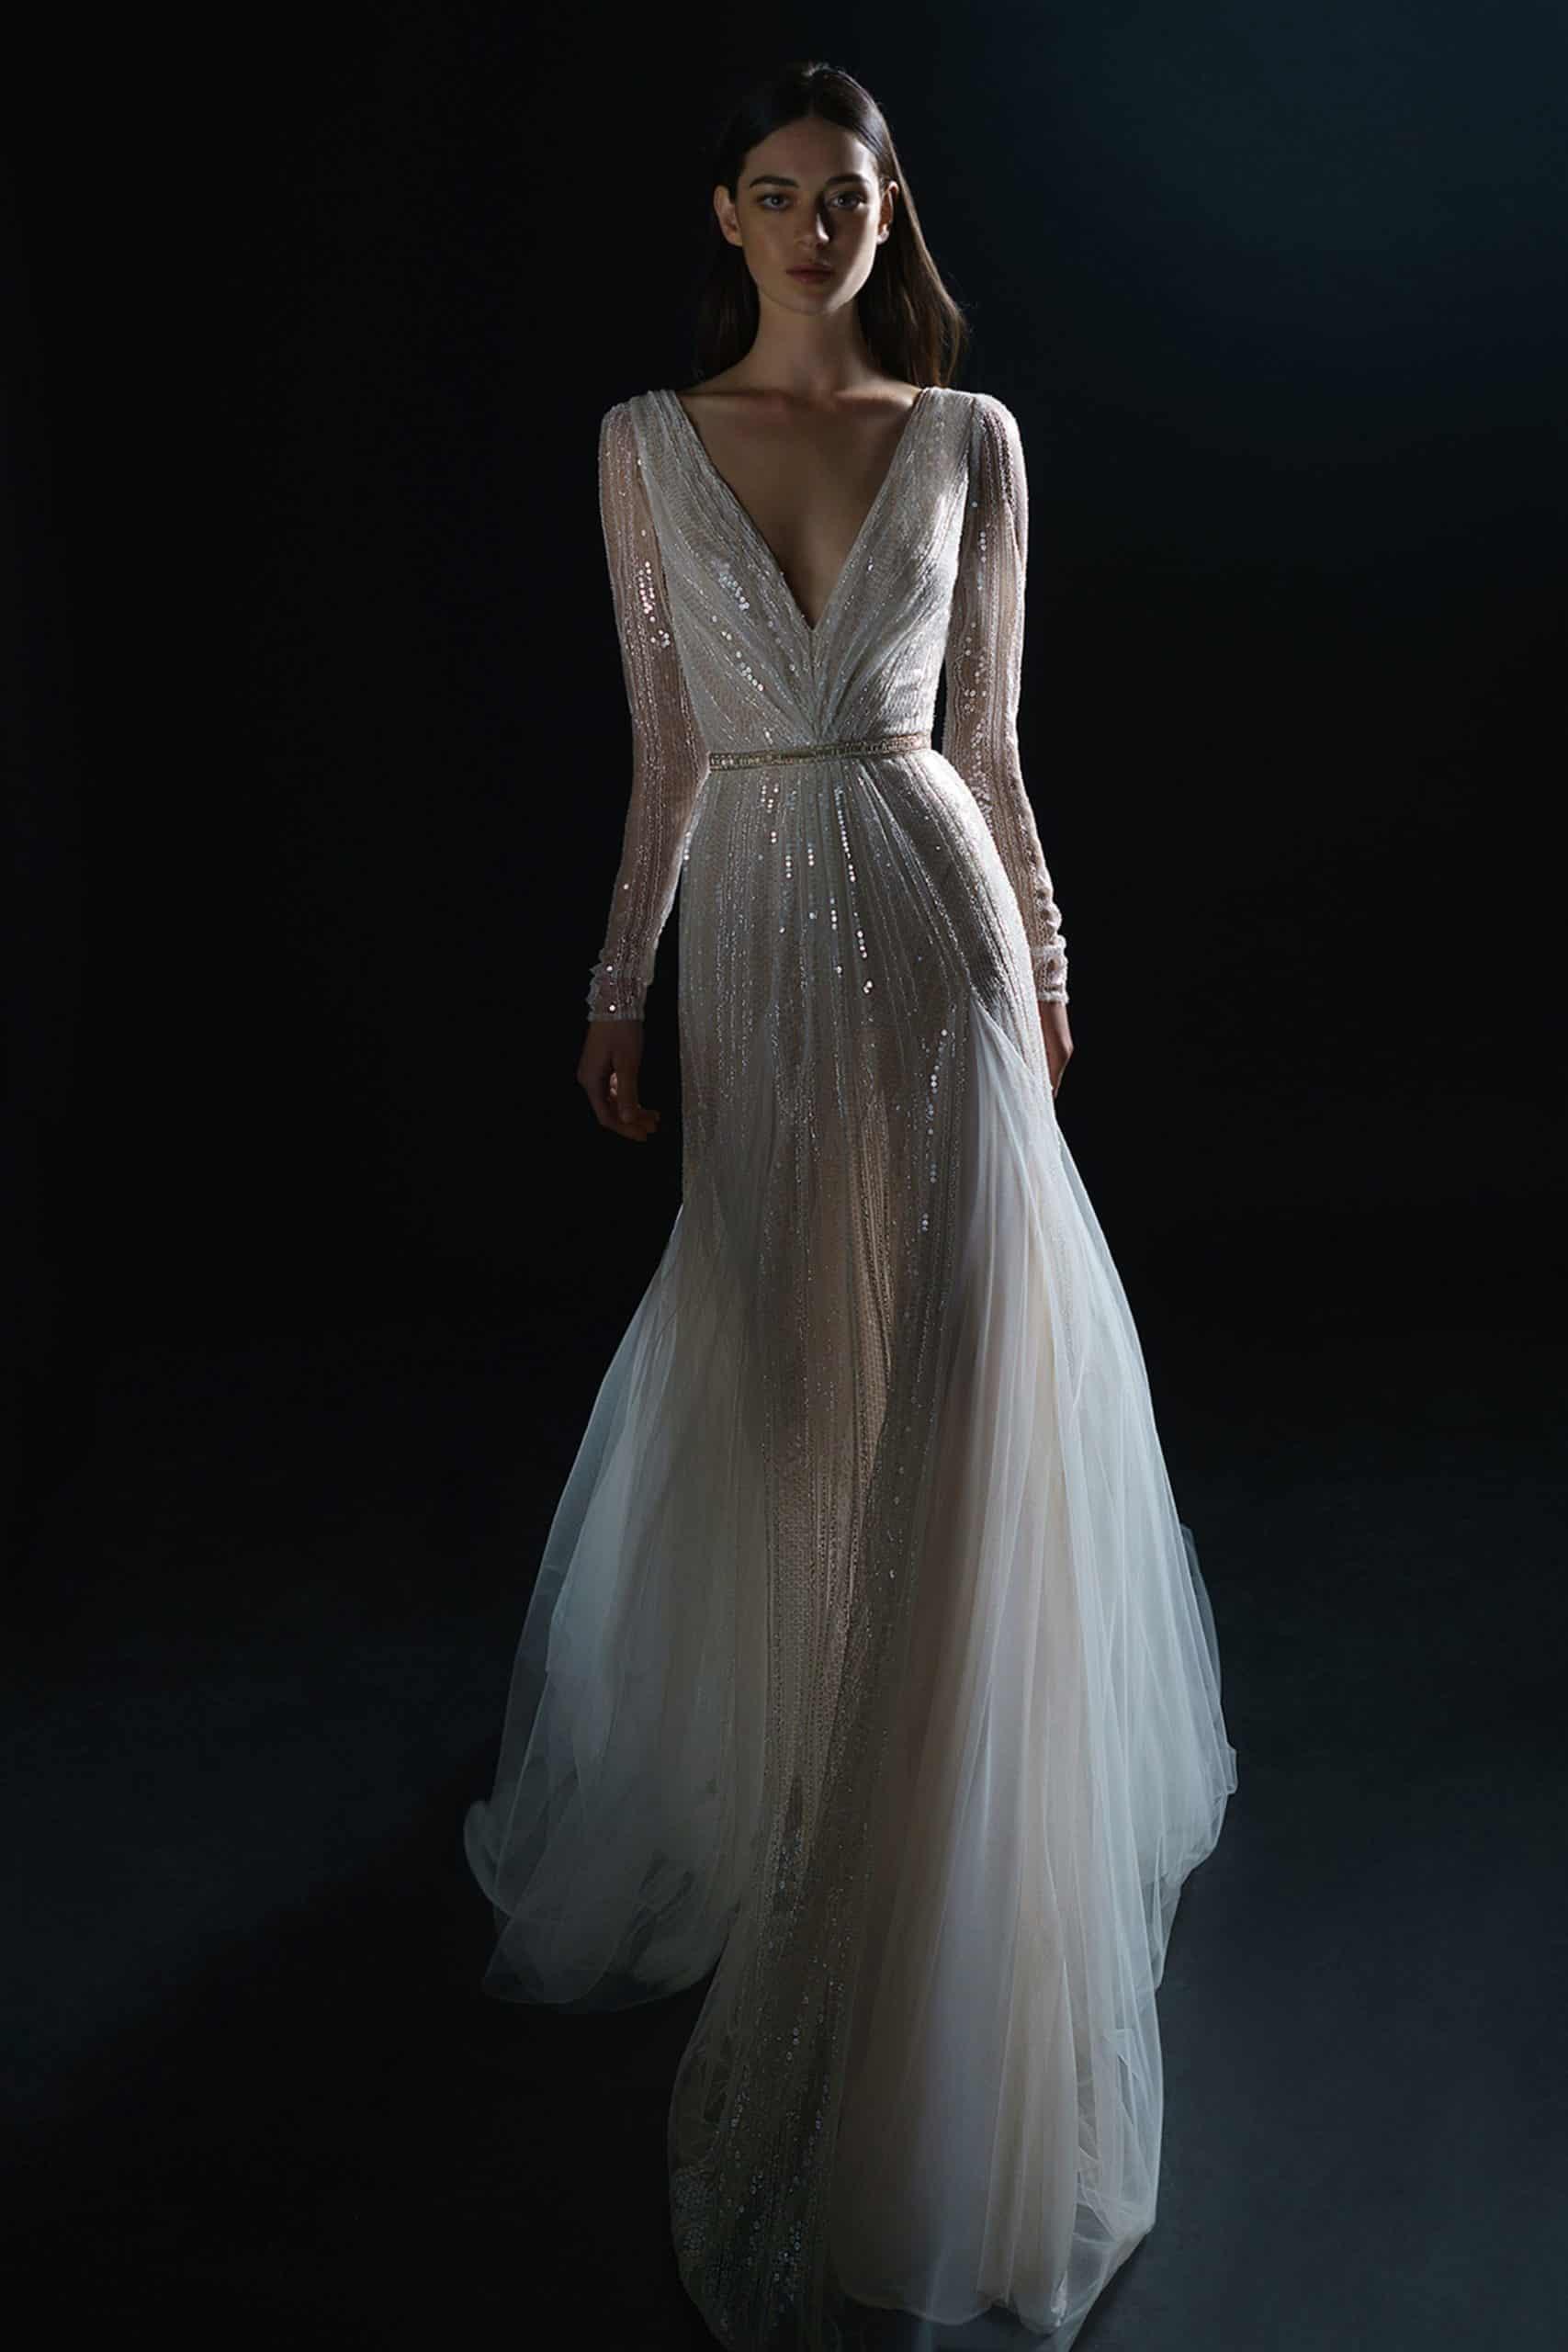 V-neck wedding dress with metallic details by Inbal Dror